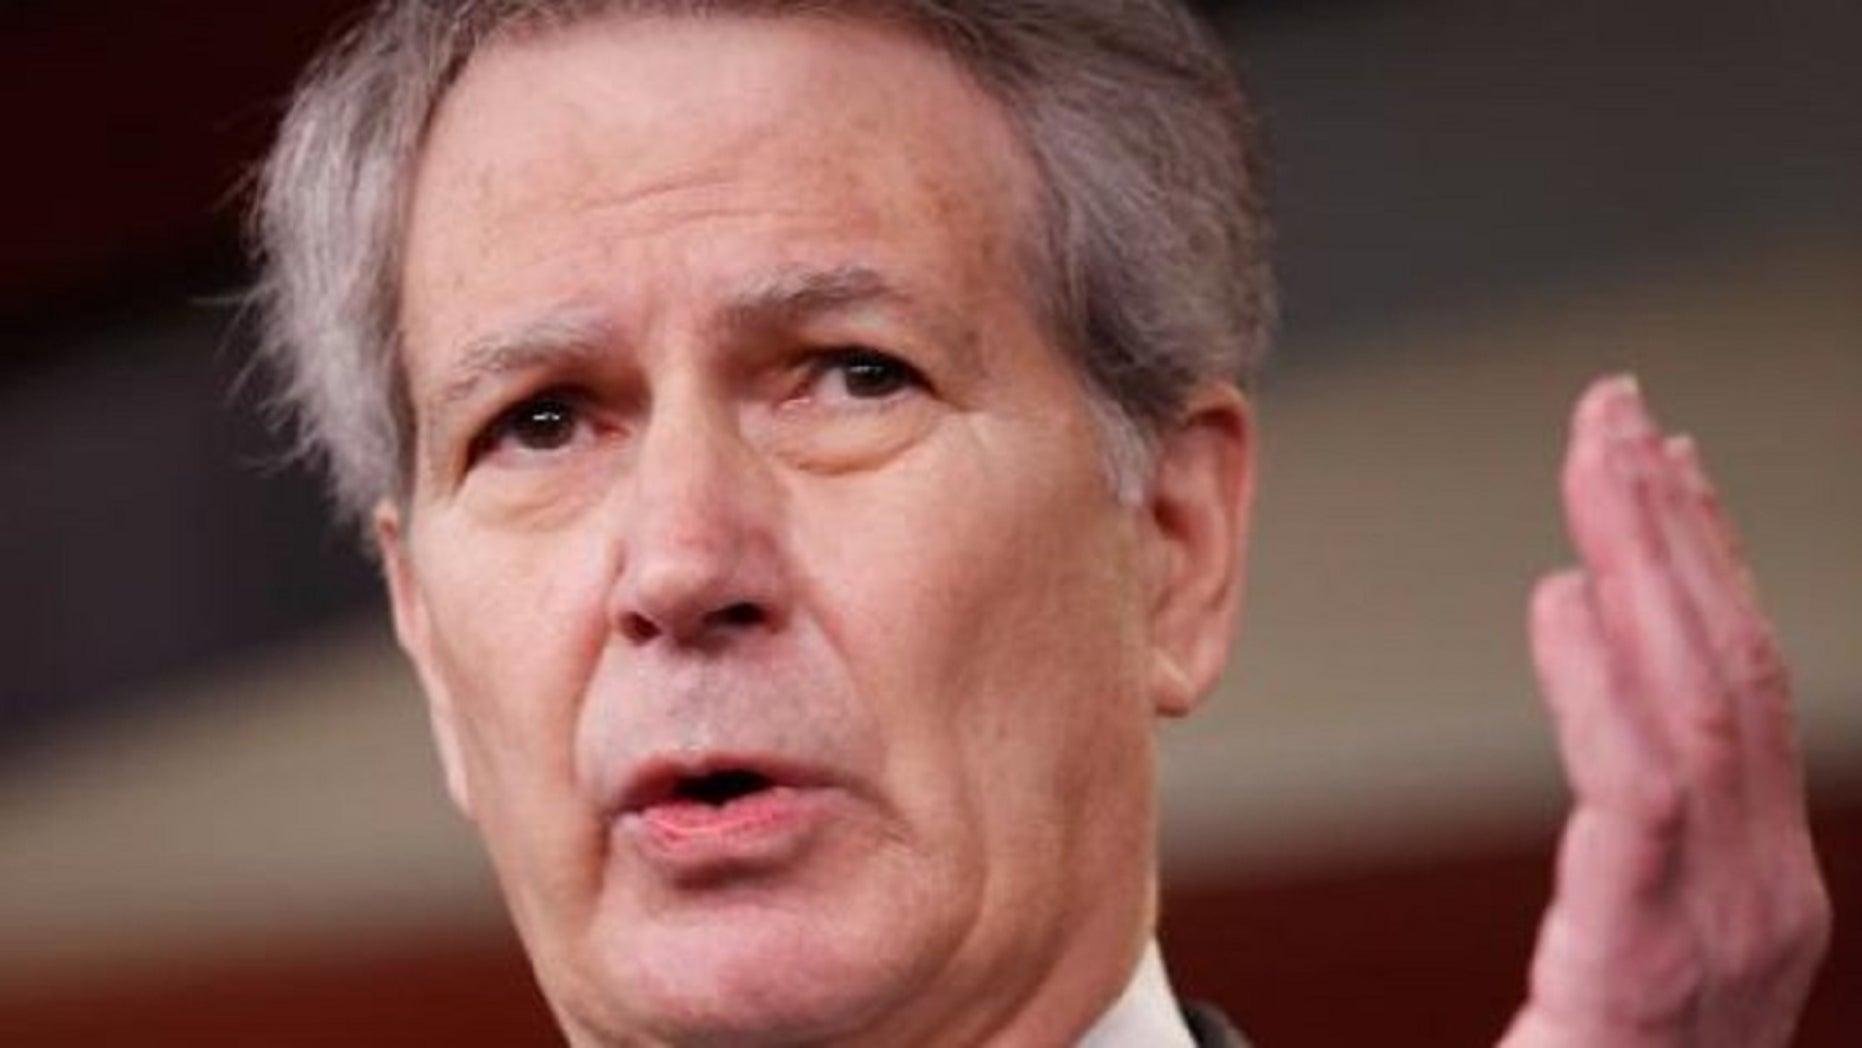 Rep. Walter Jones, R-N.C., ranks 48th out of 435 congress membersfor missed votes.